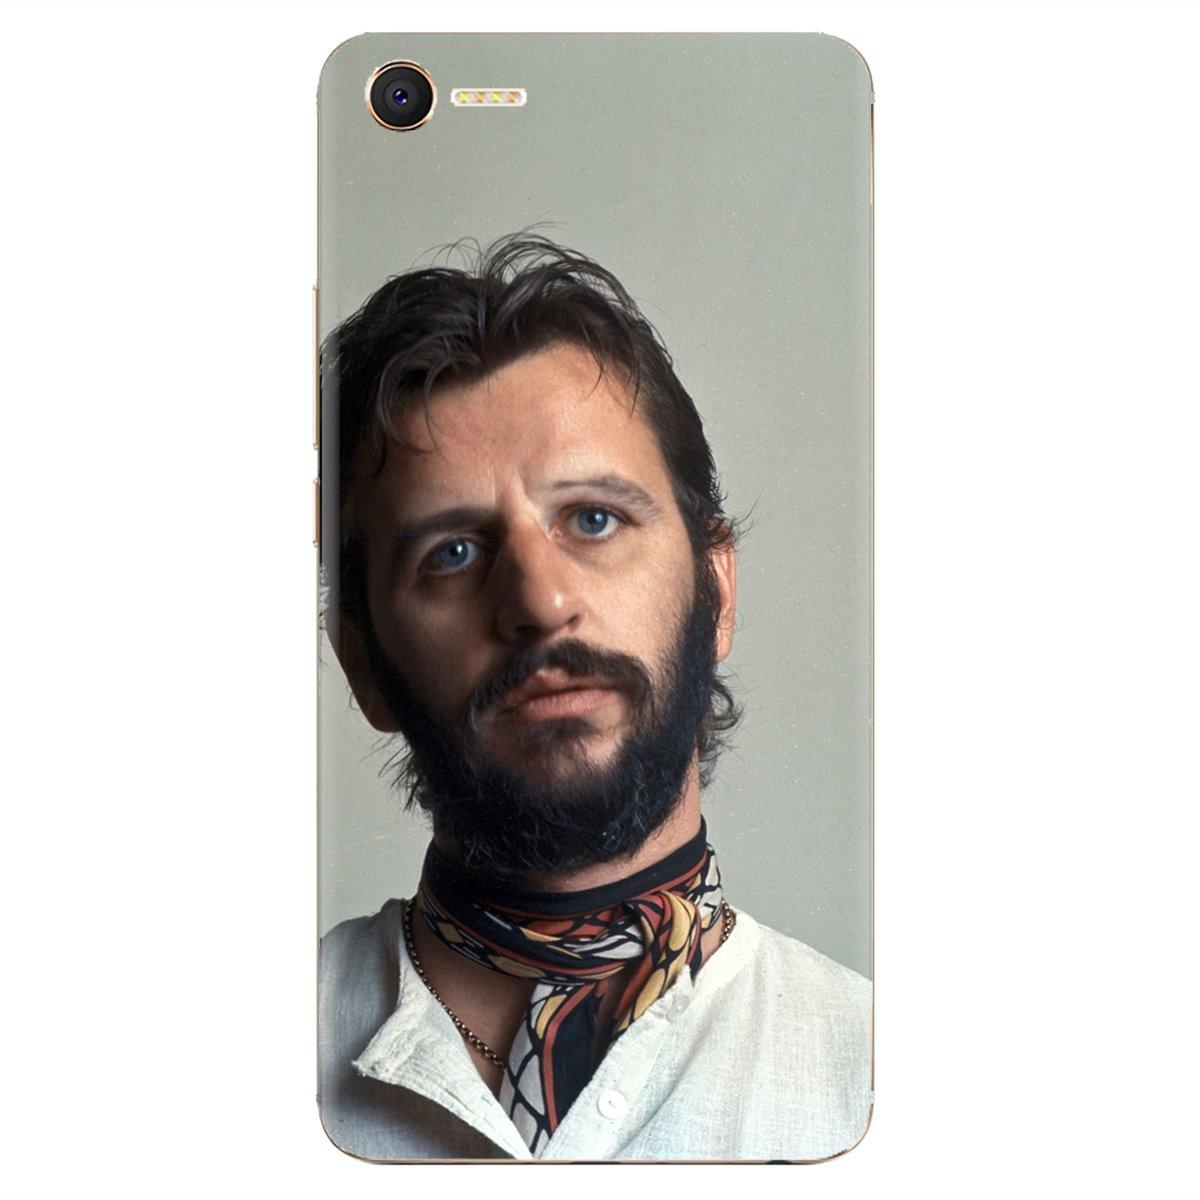 Personalizado silicone caso de telefone para huawei honor y5 2018 2019 8 s 9x pro 20 10 10i lite ringo starr